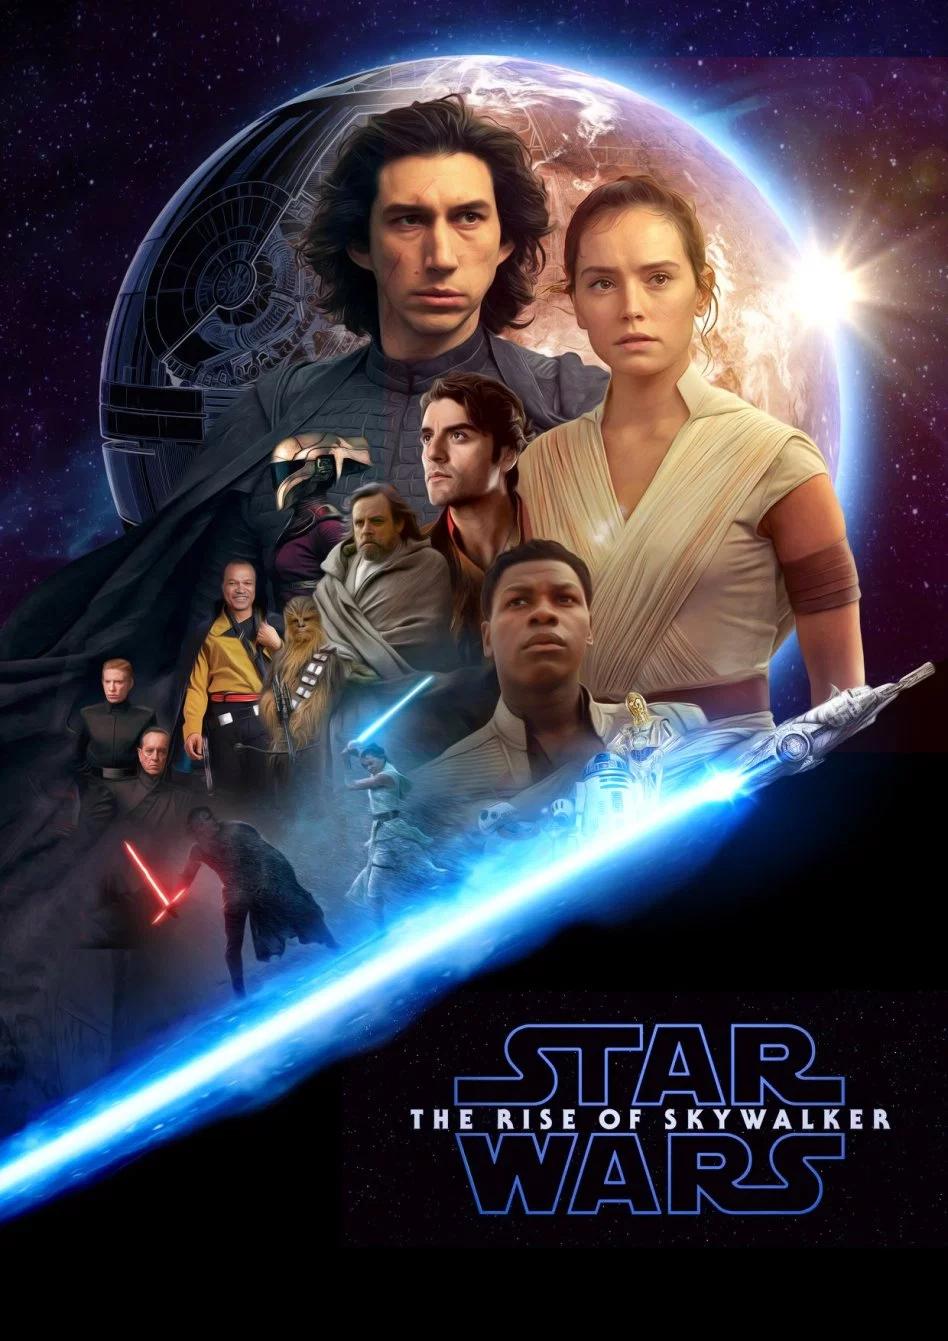 Star Wars The Rise of Skywalker FanArt Poster by Augen2 #rey